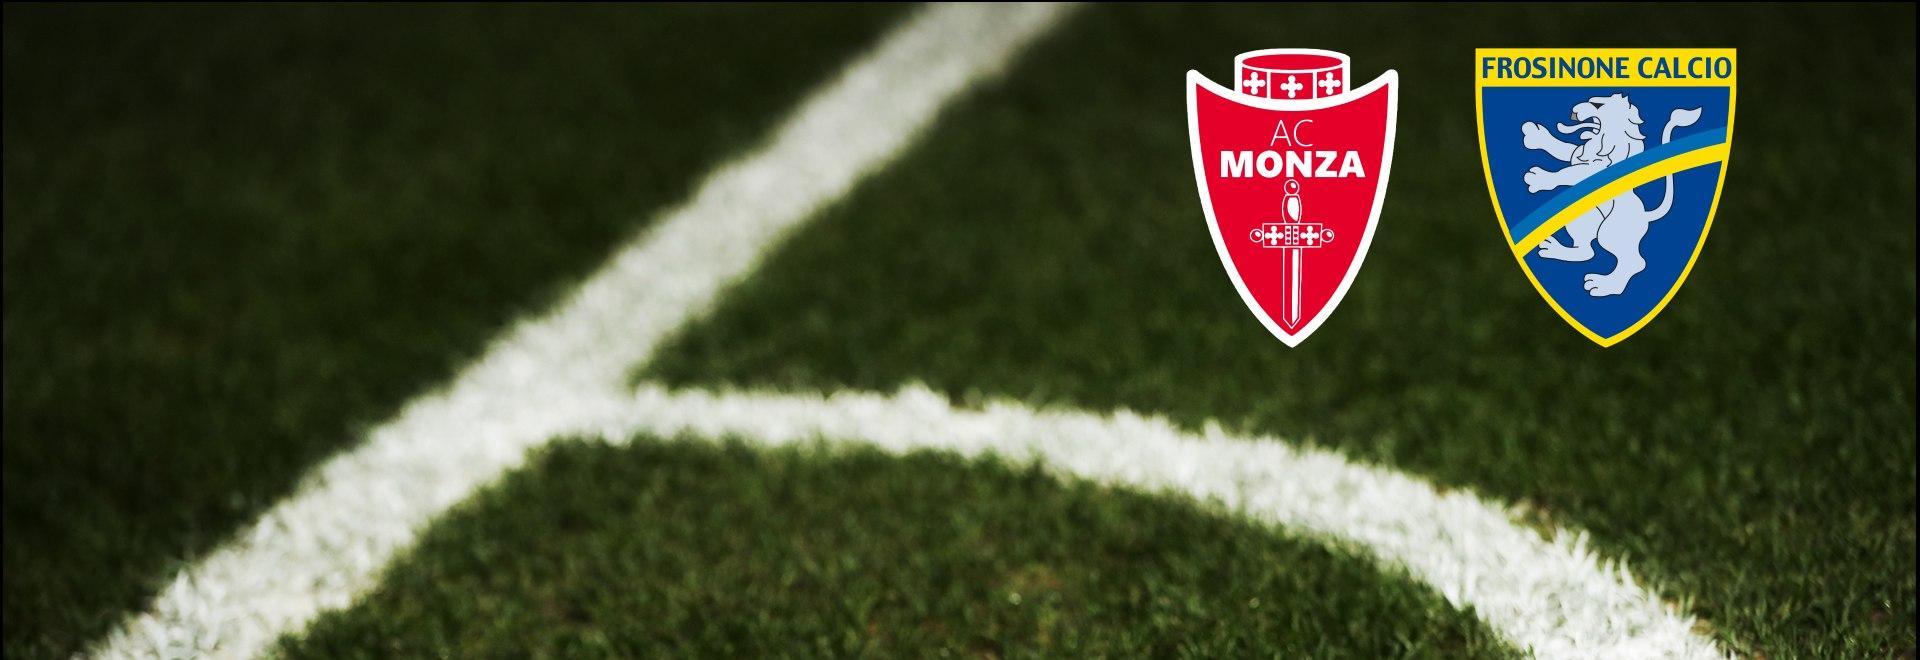 Monza - Frosinone. 7a g.